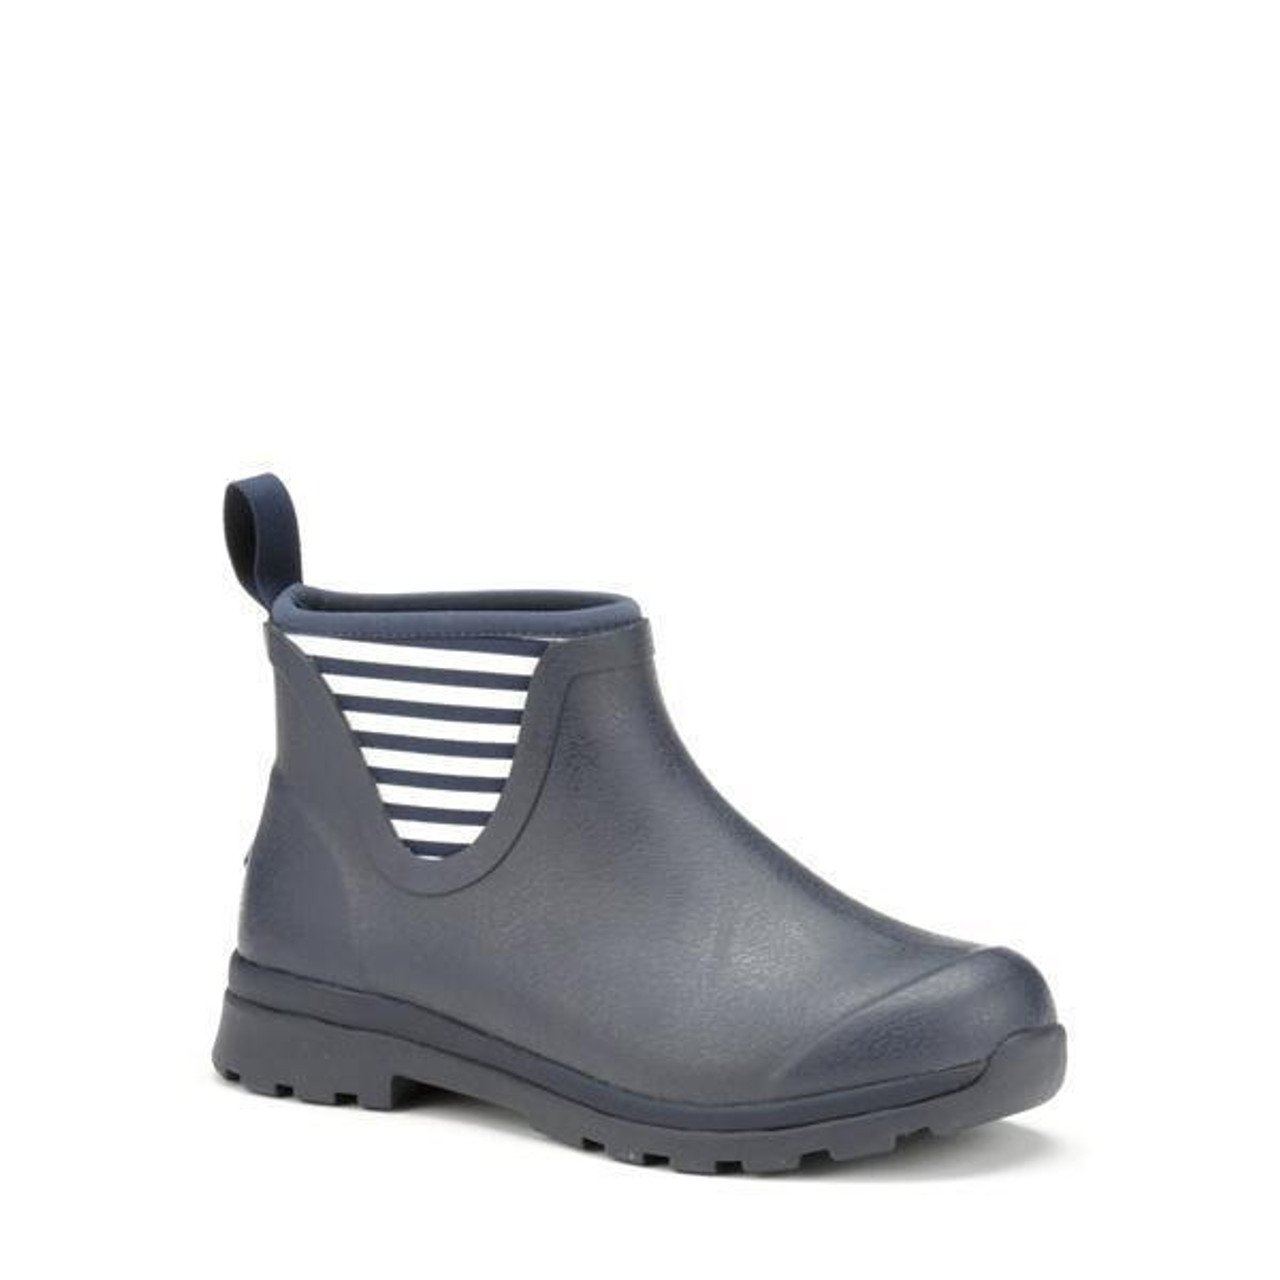 Muck Boots Cambridge Ankle Women's Rain